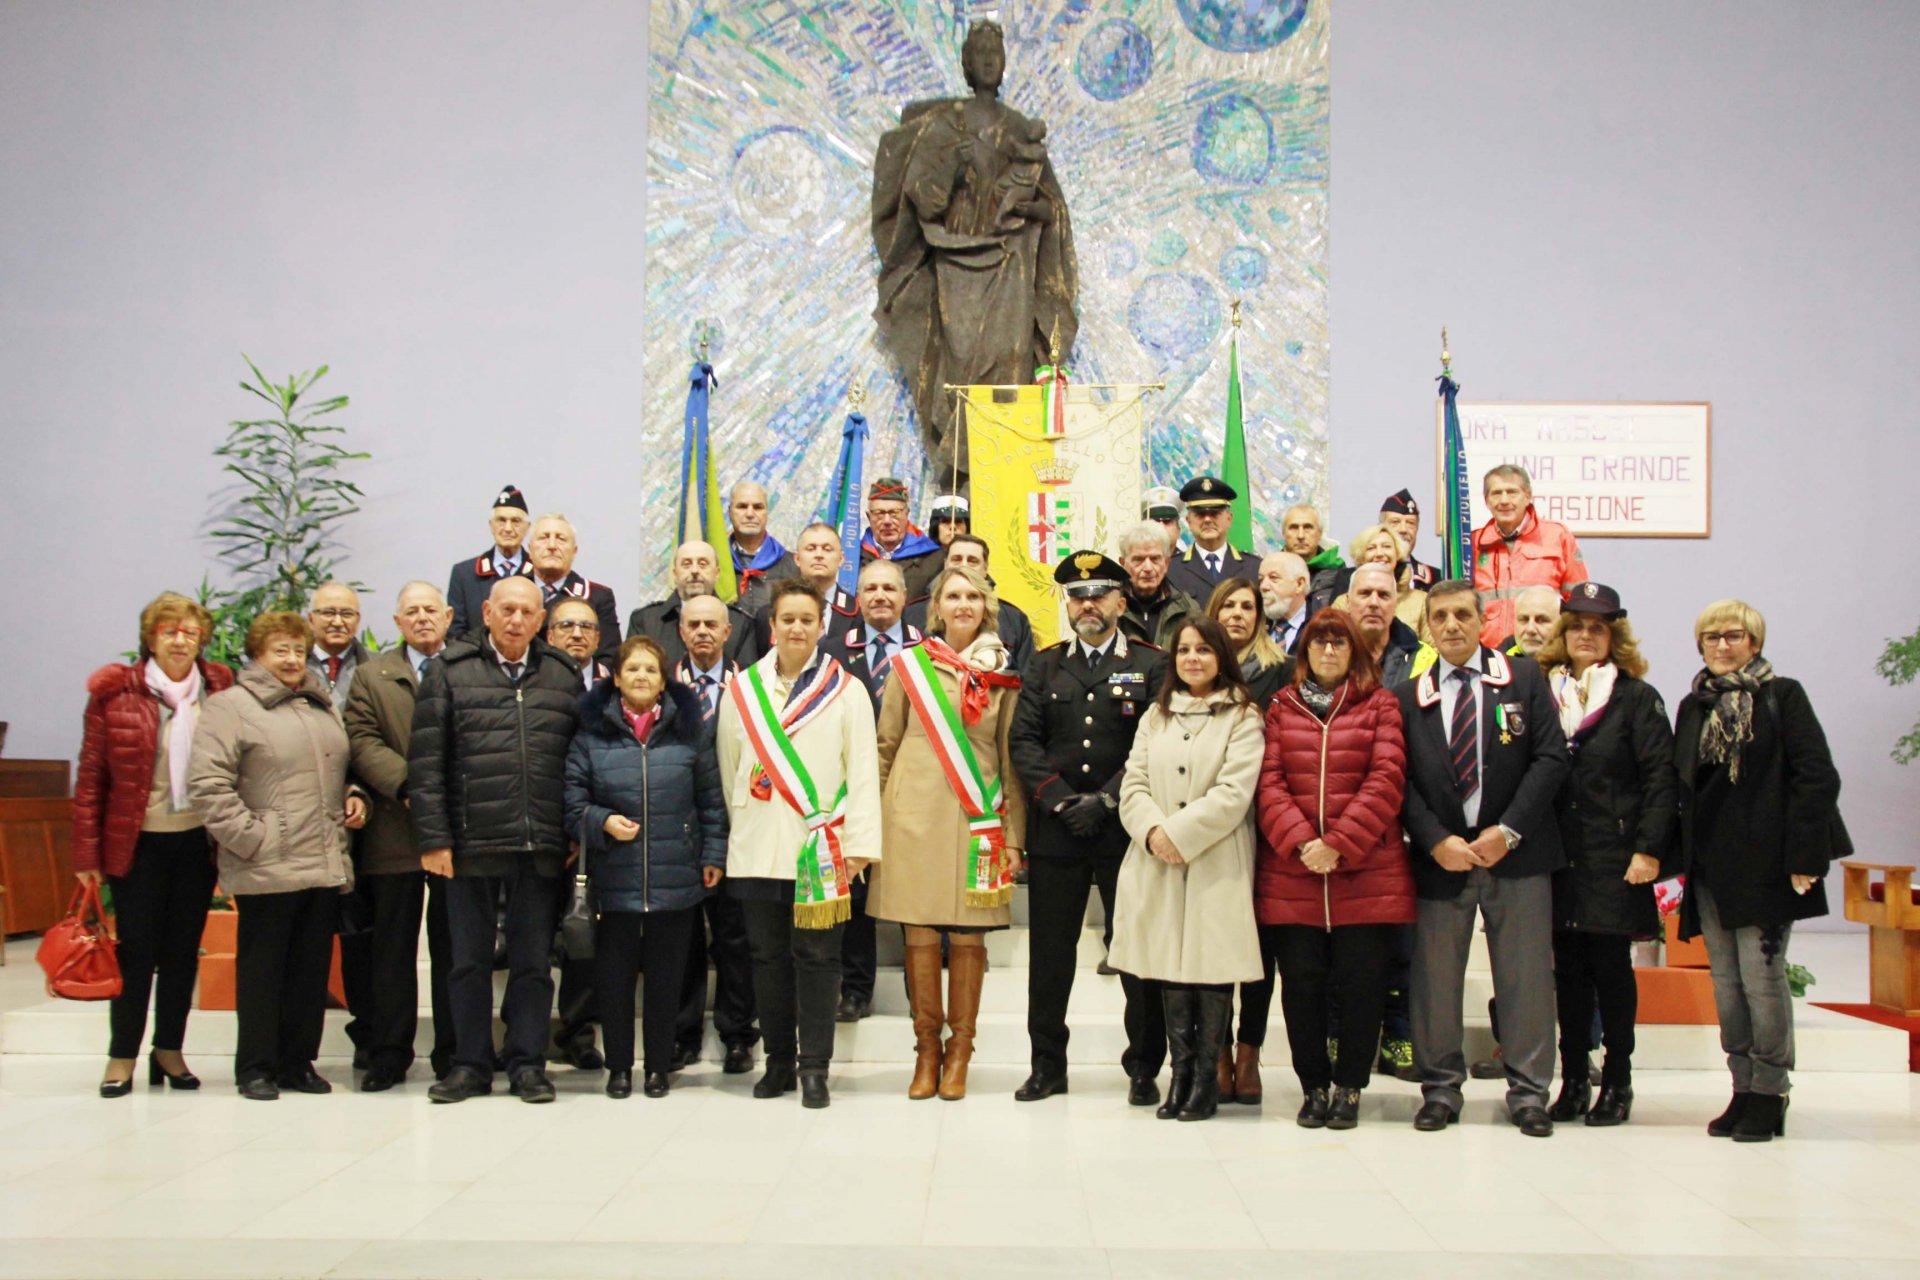 Virgo fidelis in 110 per la festa dei carabinieri a Pioltello - La Martesana